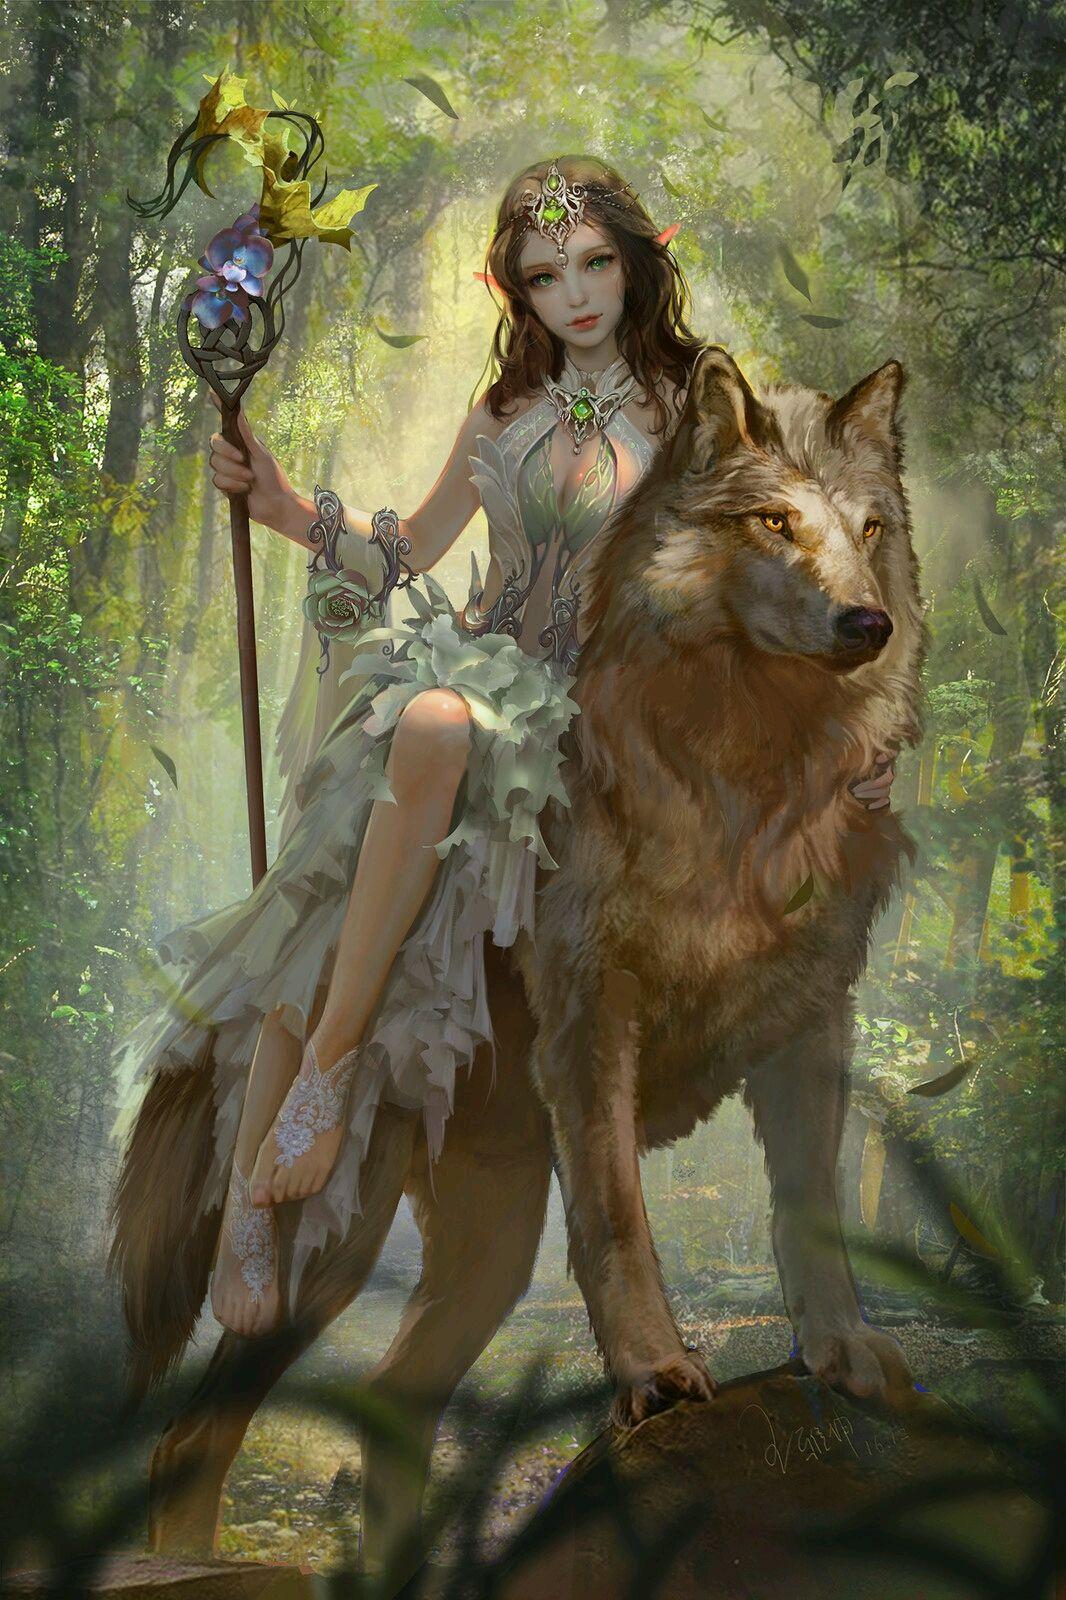 Promises Kept >> Voice of Nature : Photo | Goddess Art | Pinterest | Nature photos, Elves and Forest elf